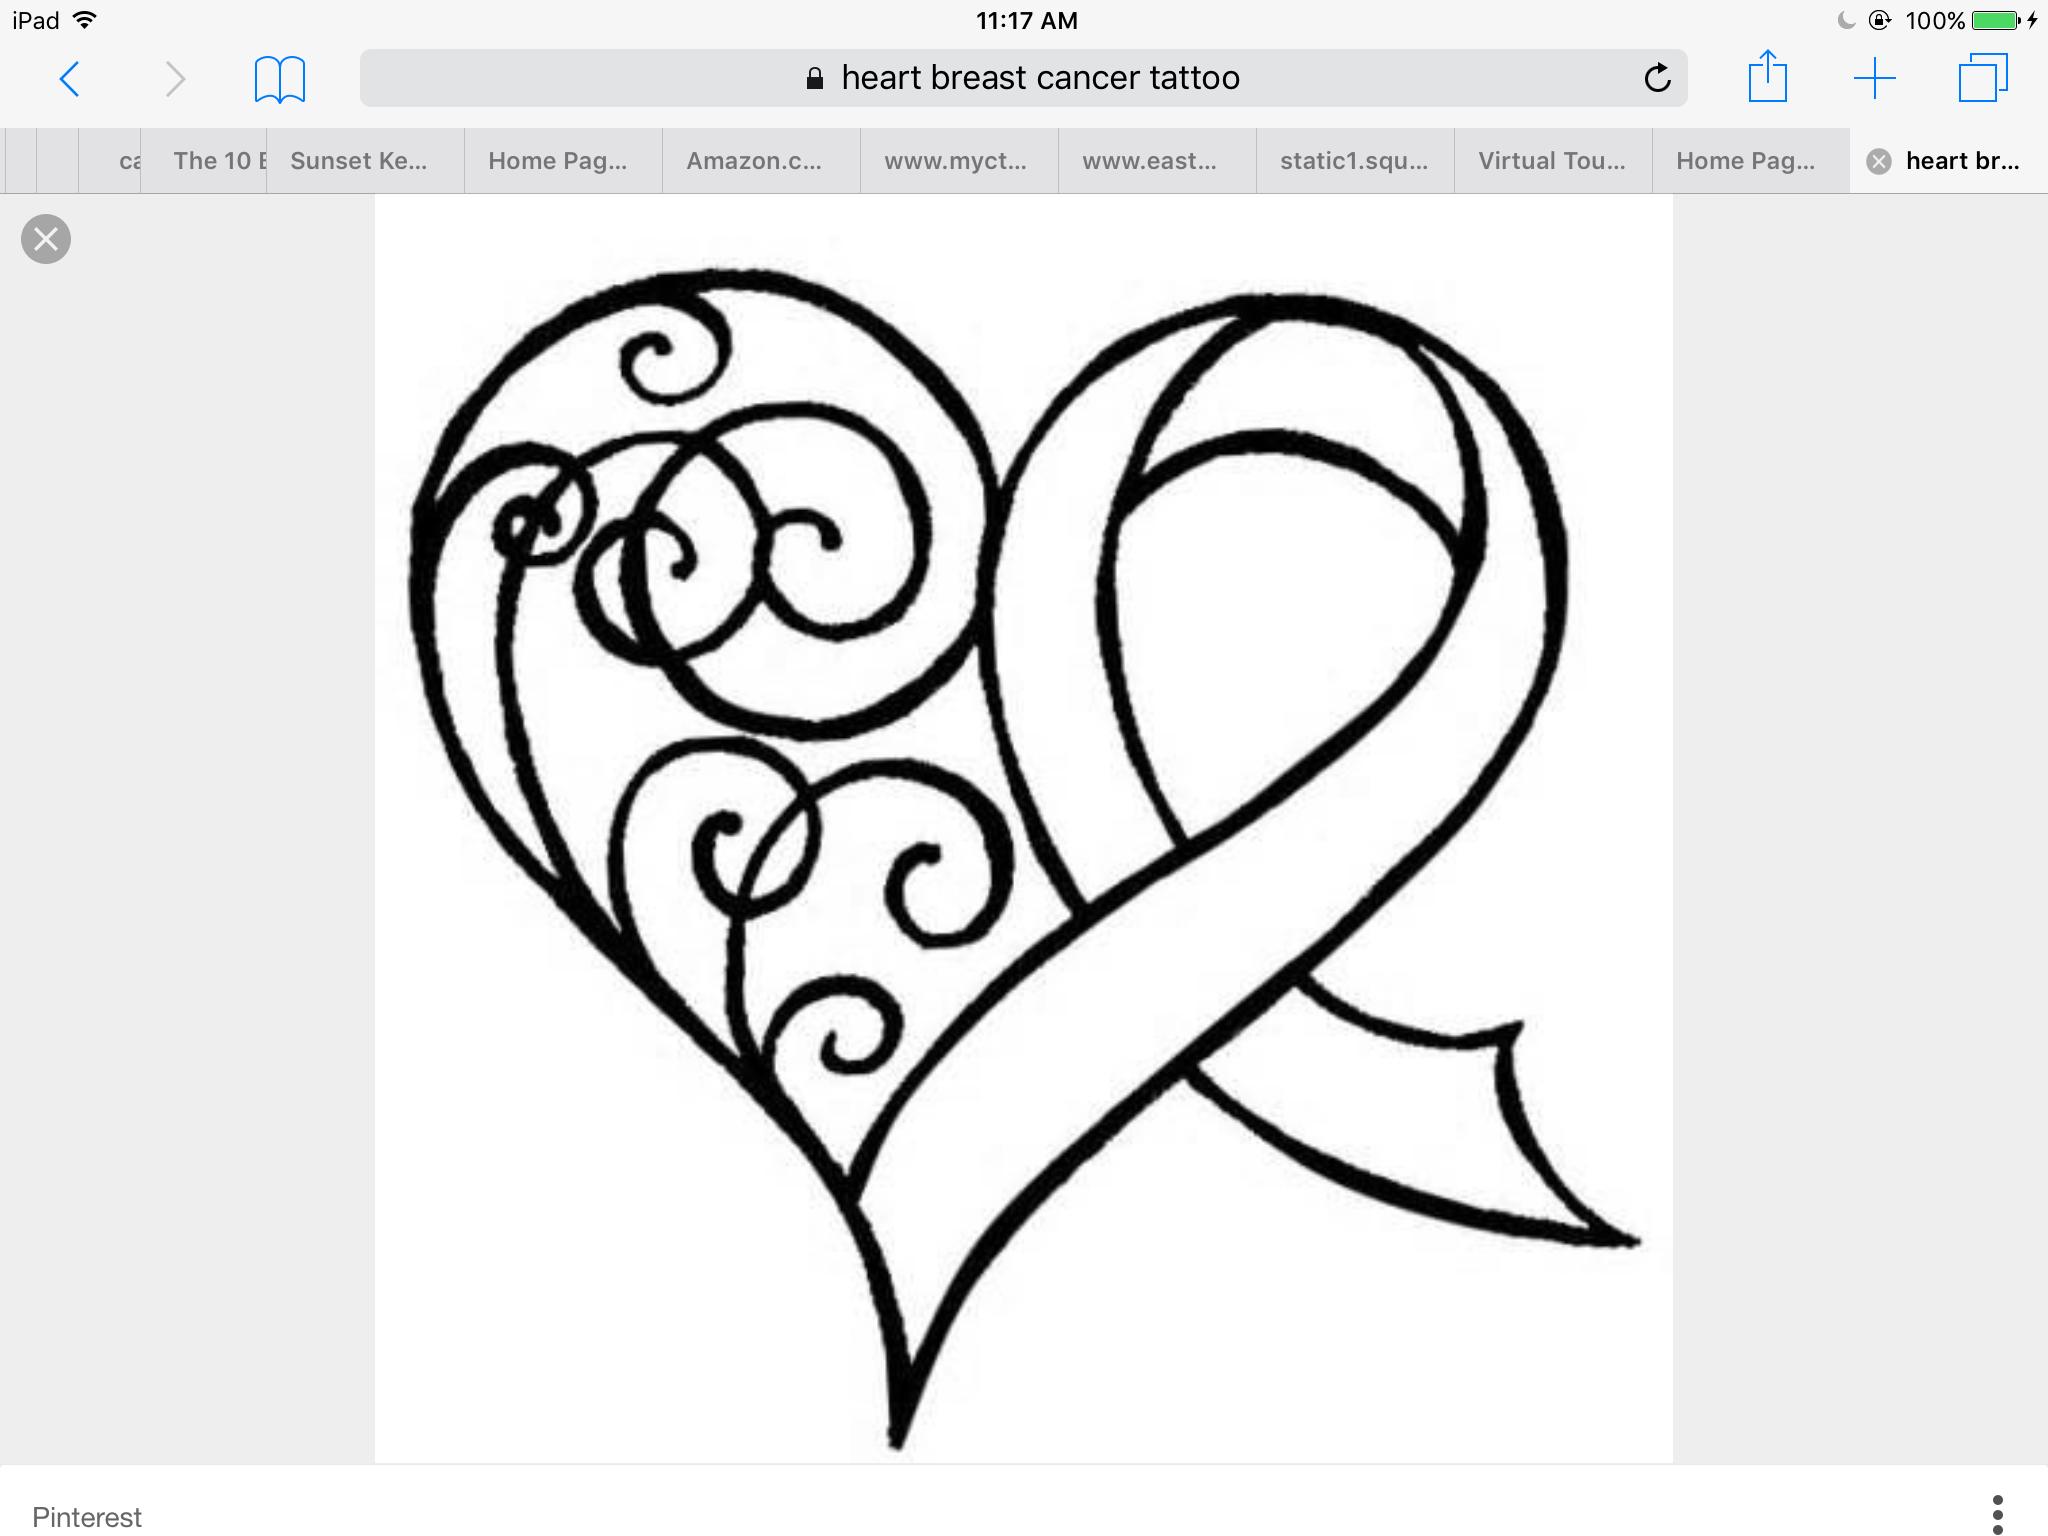 Pin de Maryanne Quara en Fuck cancer | Pinterest